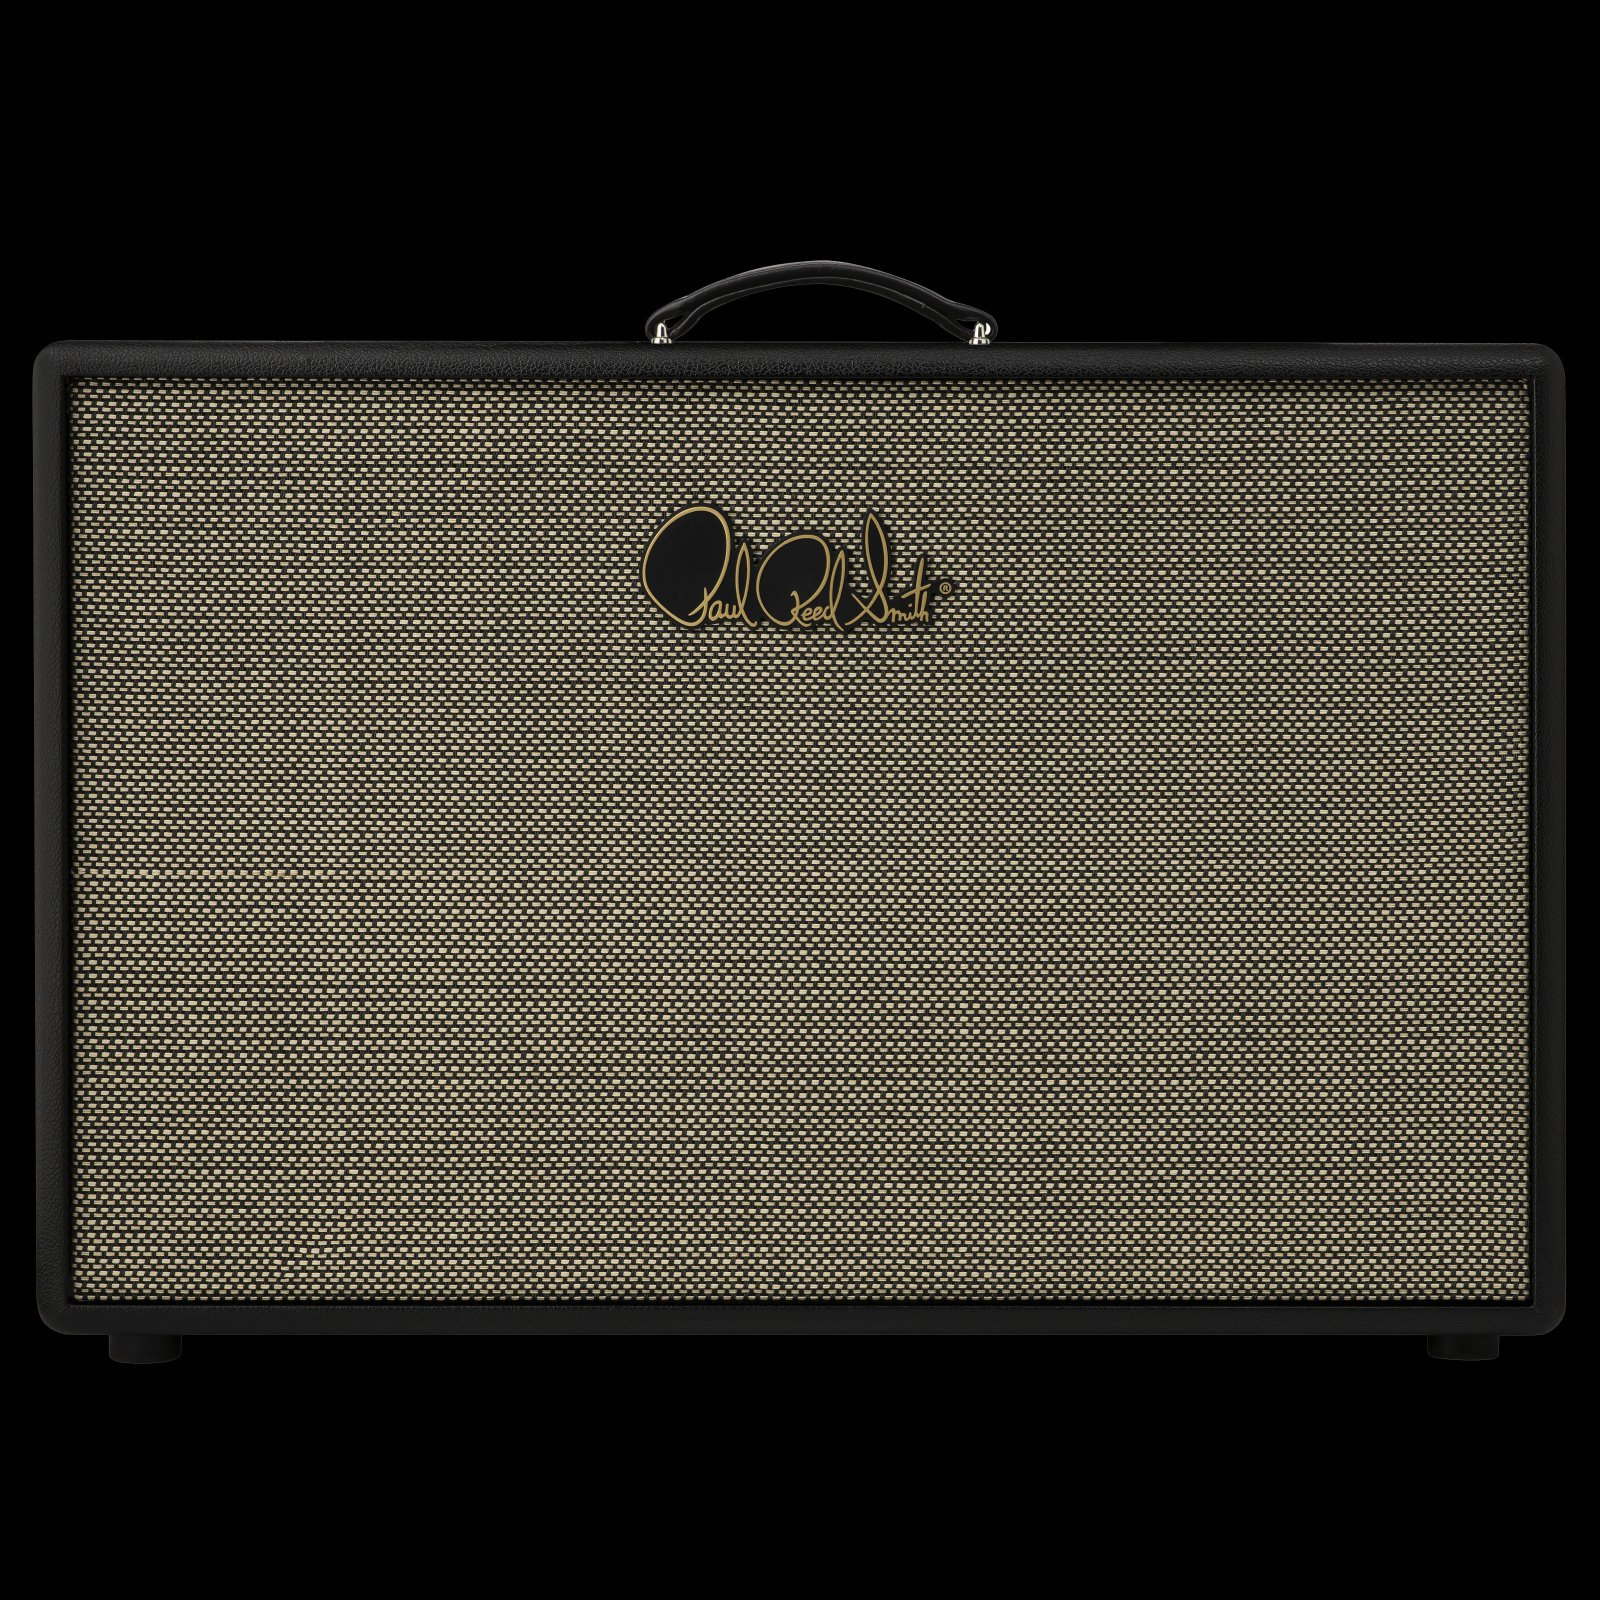 PRS HX 2x12 Closed Back Speaker Cabinet